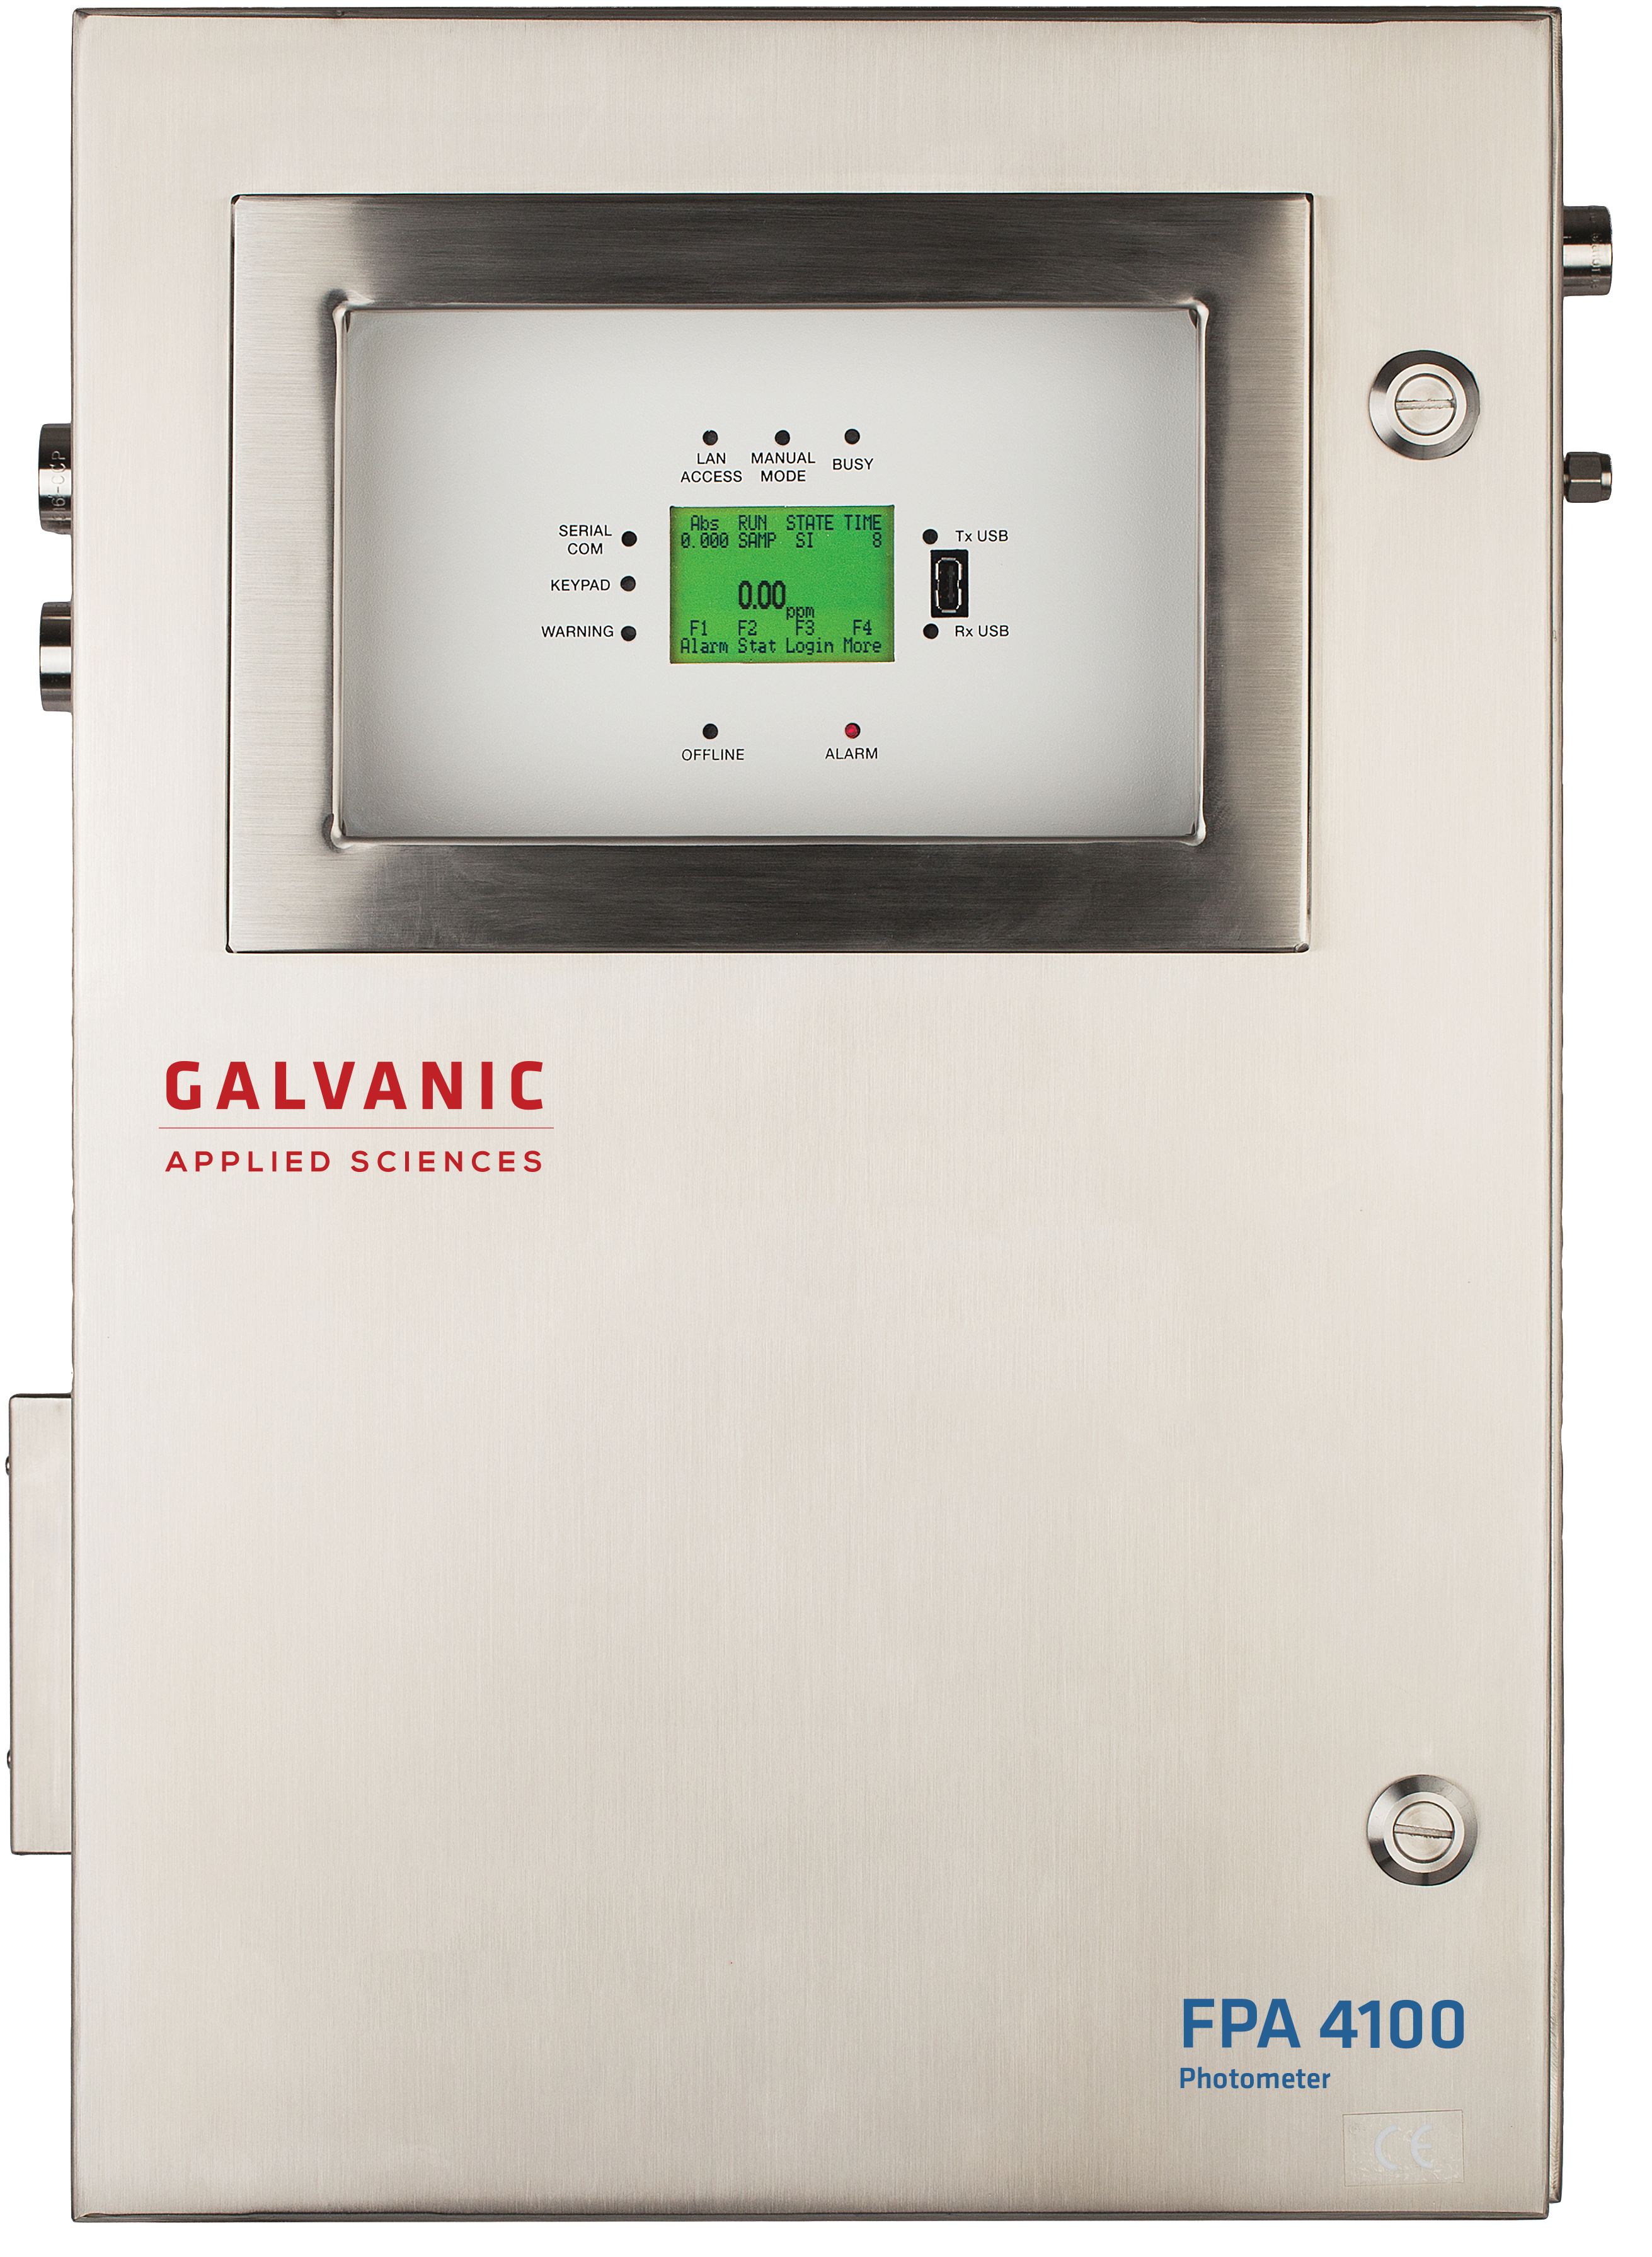 FPA 4100 firmy Galvanic